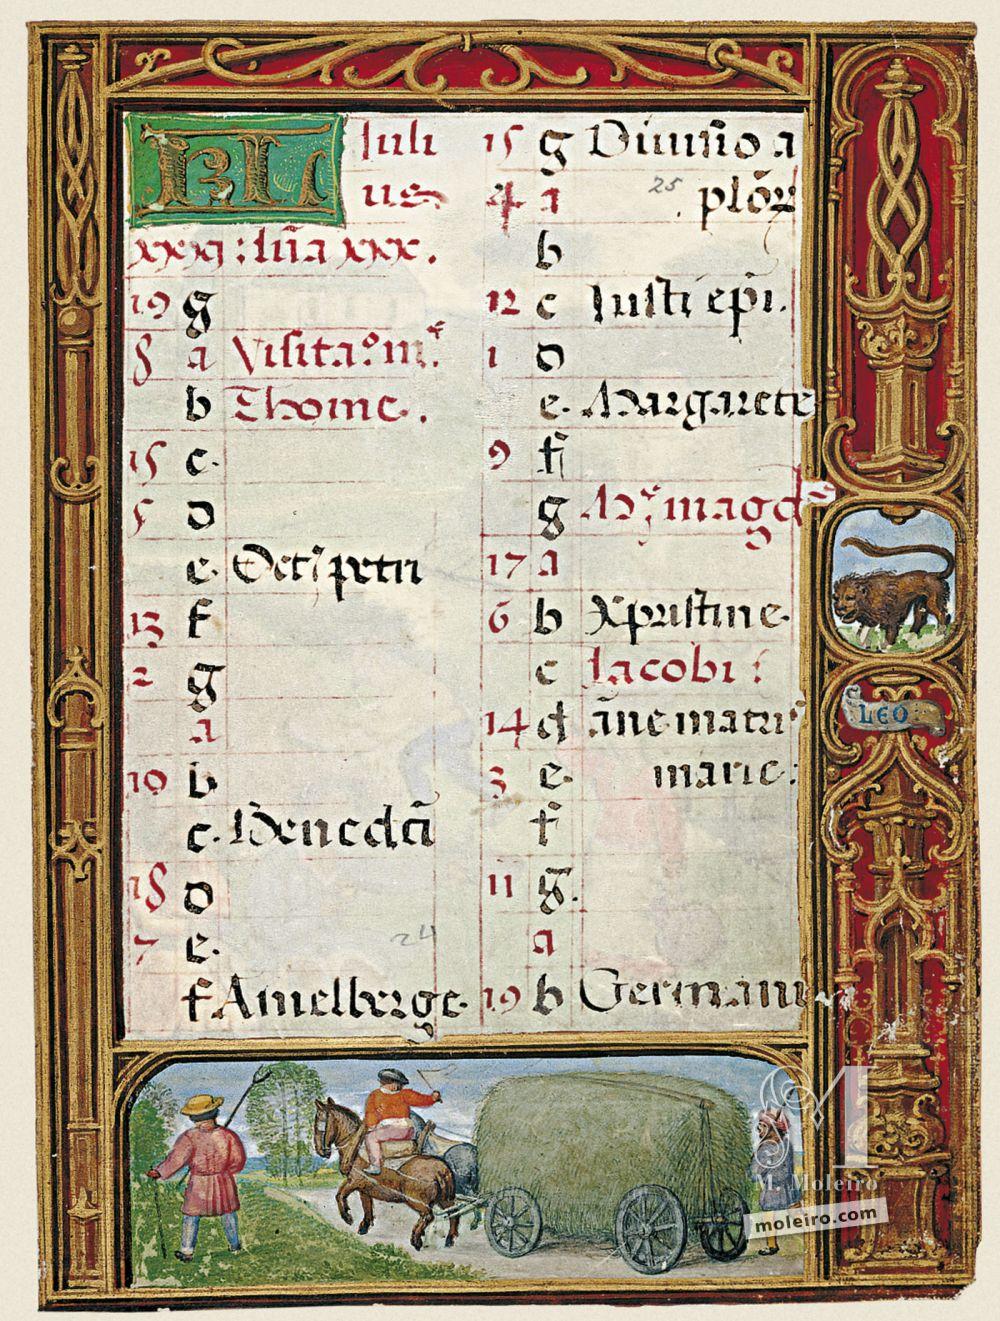 The Golf Book (Book of Hours) f. 25r, calendar, July